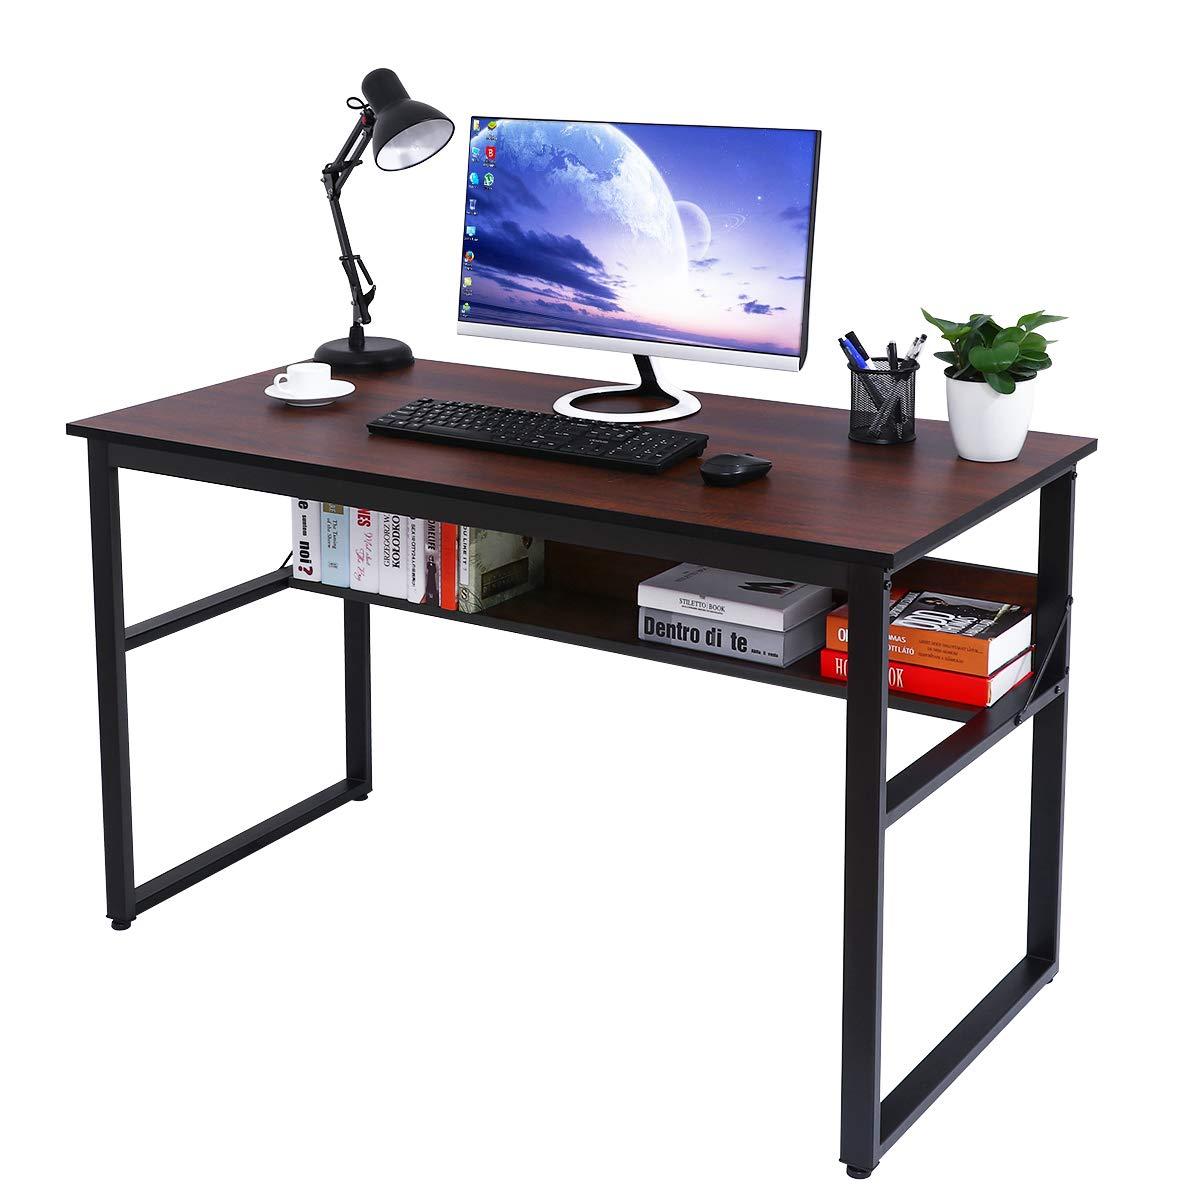 Astonishing Details About Homemaxs Computer Desk With Bookshelf 47X23 Large Office Desk Workstation Home Interior And Landscaping Ferensignezvosmurscom